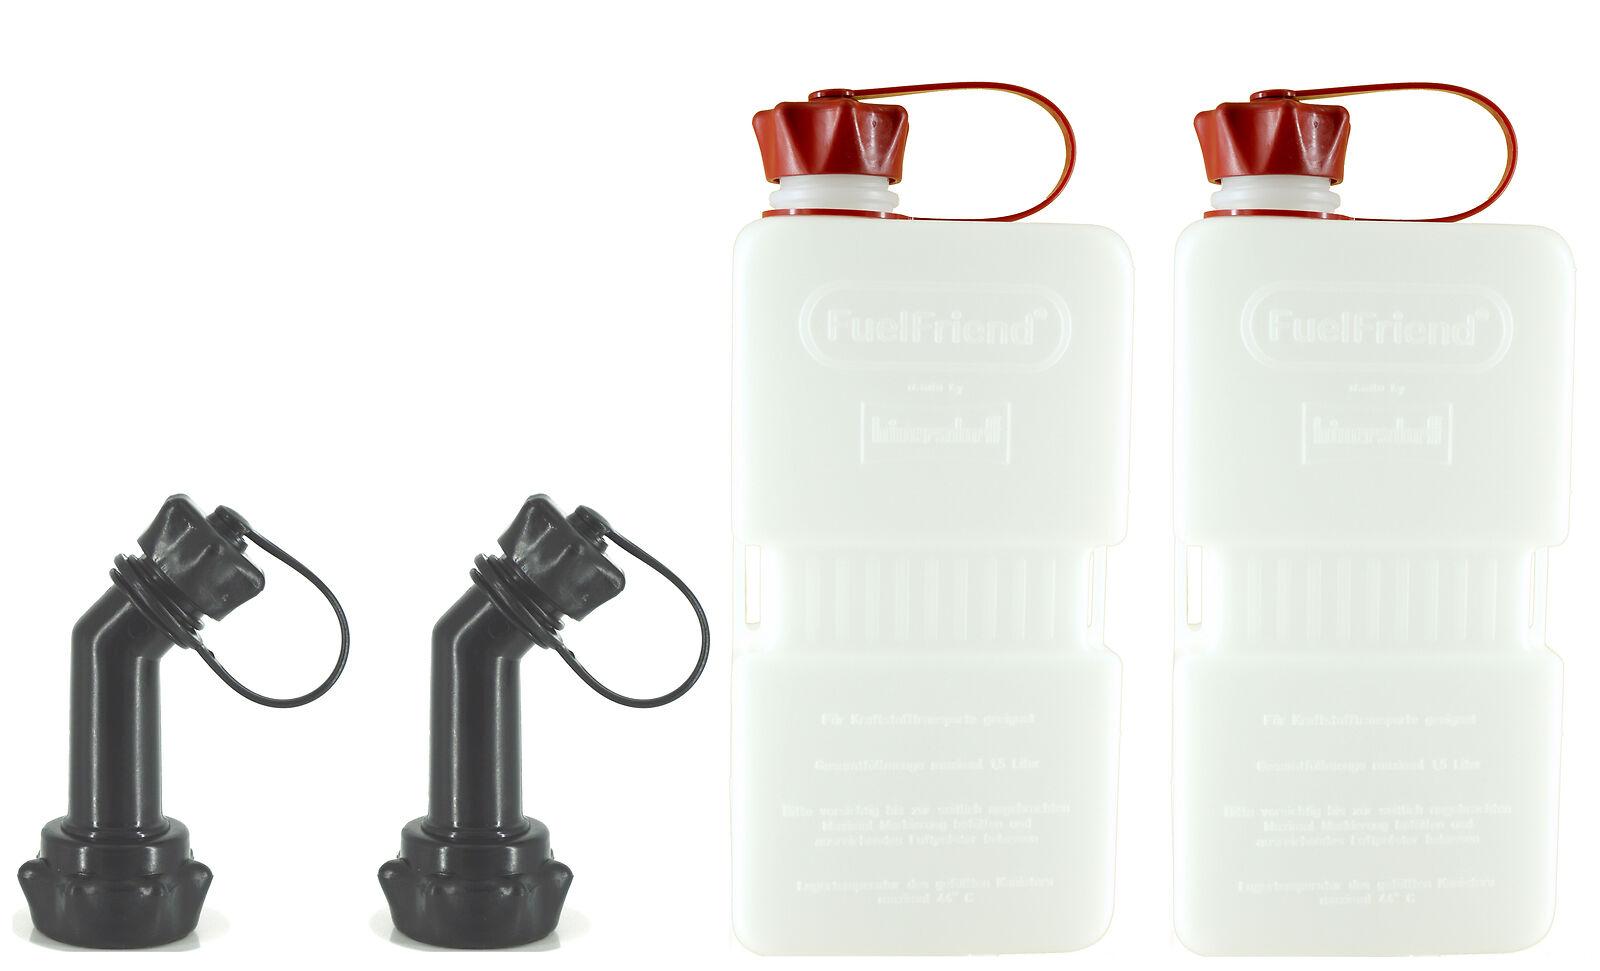 2x Fuelfriend® Plus Clear 1,5 Liter Mini-benzinkanister + Füllrohr Verschließbar 4